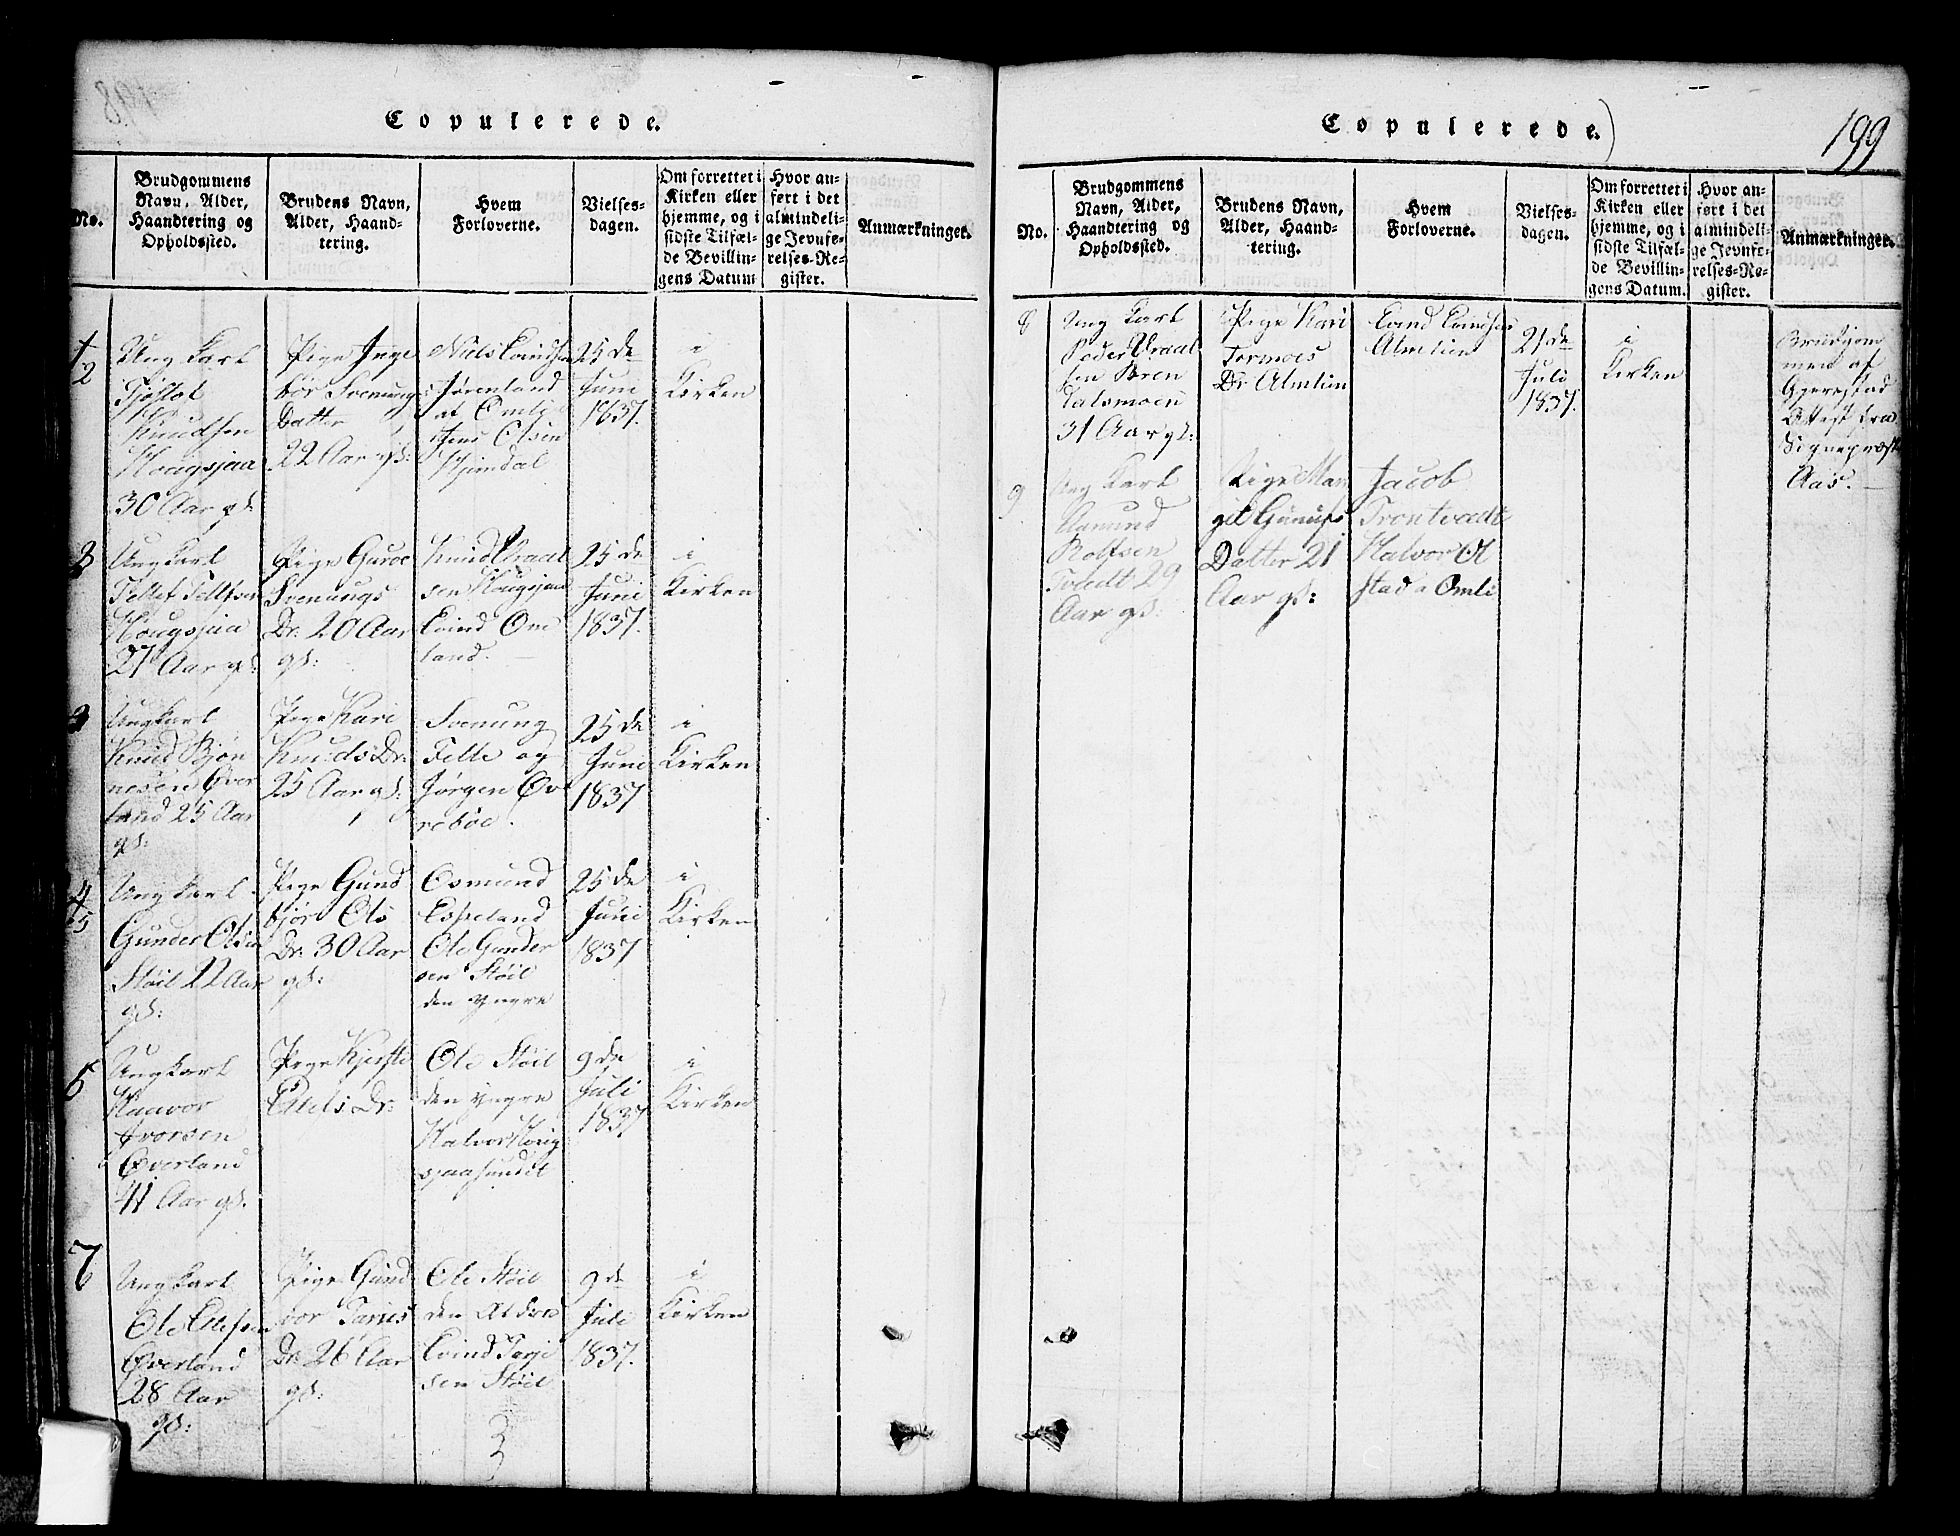 SAKO, Nissedal kirkebøker, G/Gb/L0001: Klokkerbok nr. II 1, 1814-1862, s. 199